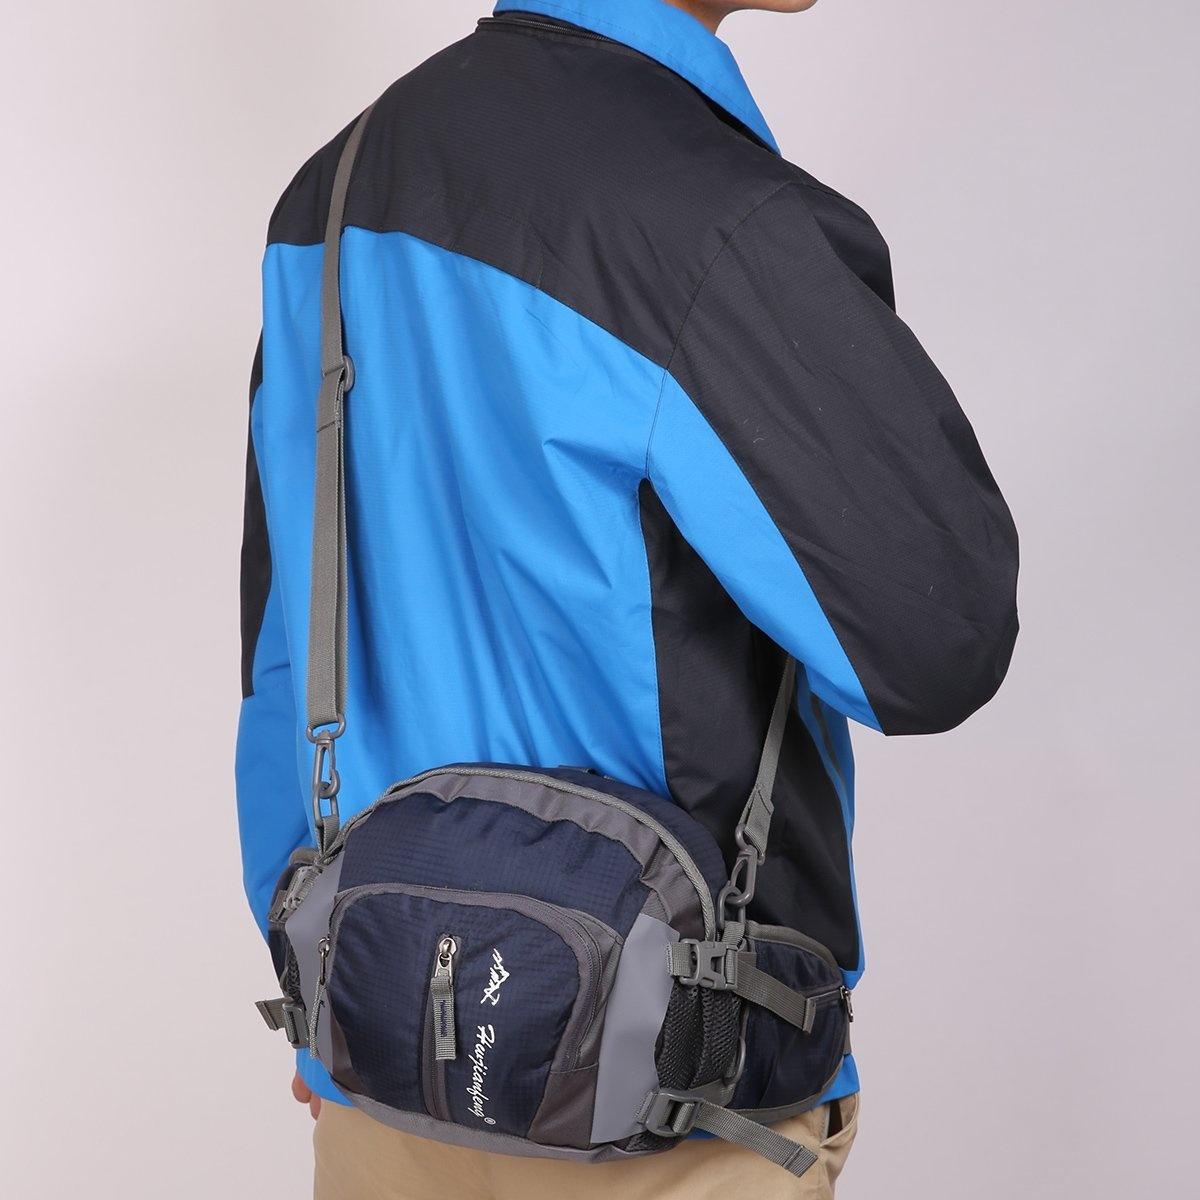 Black-HWJIANFENG-Crossbody-Waist-Bag-Funny-Pack-Hiking-Cycling-Travelling